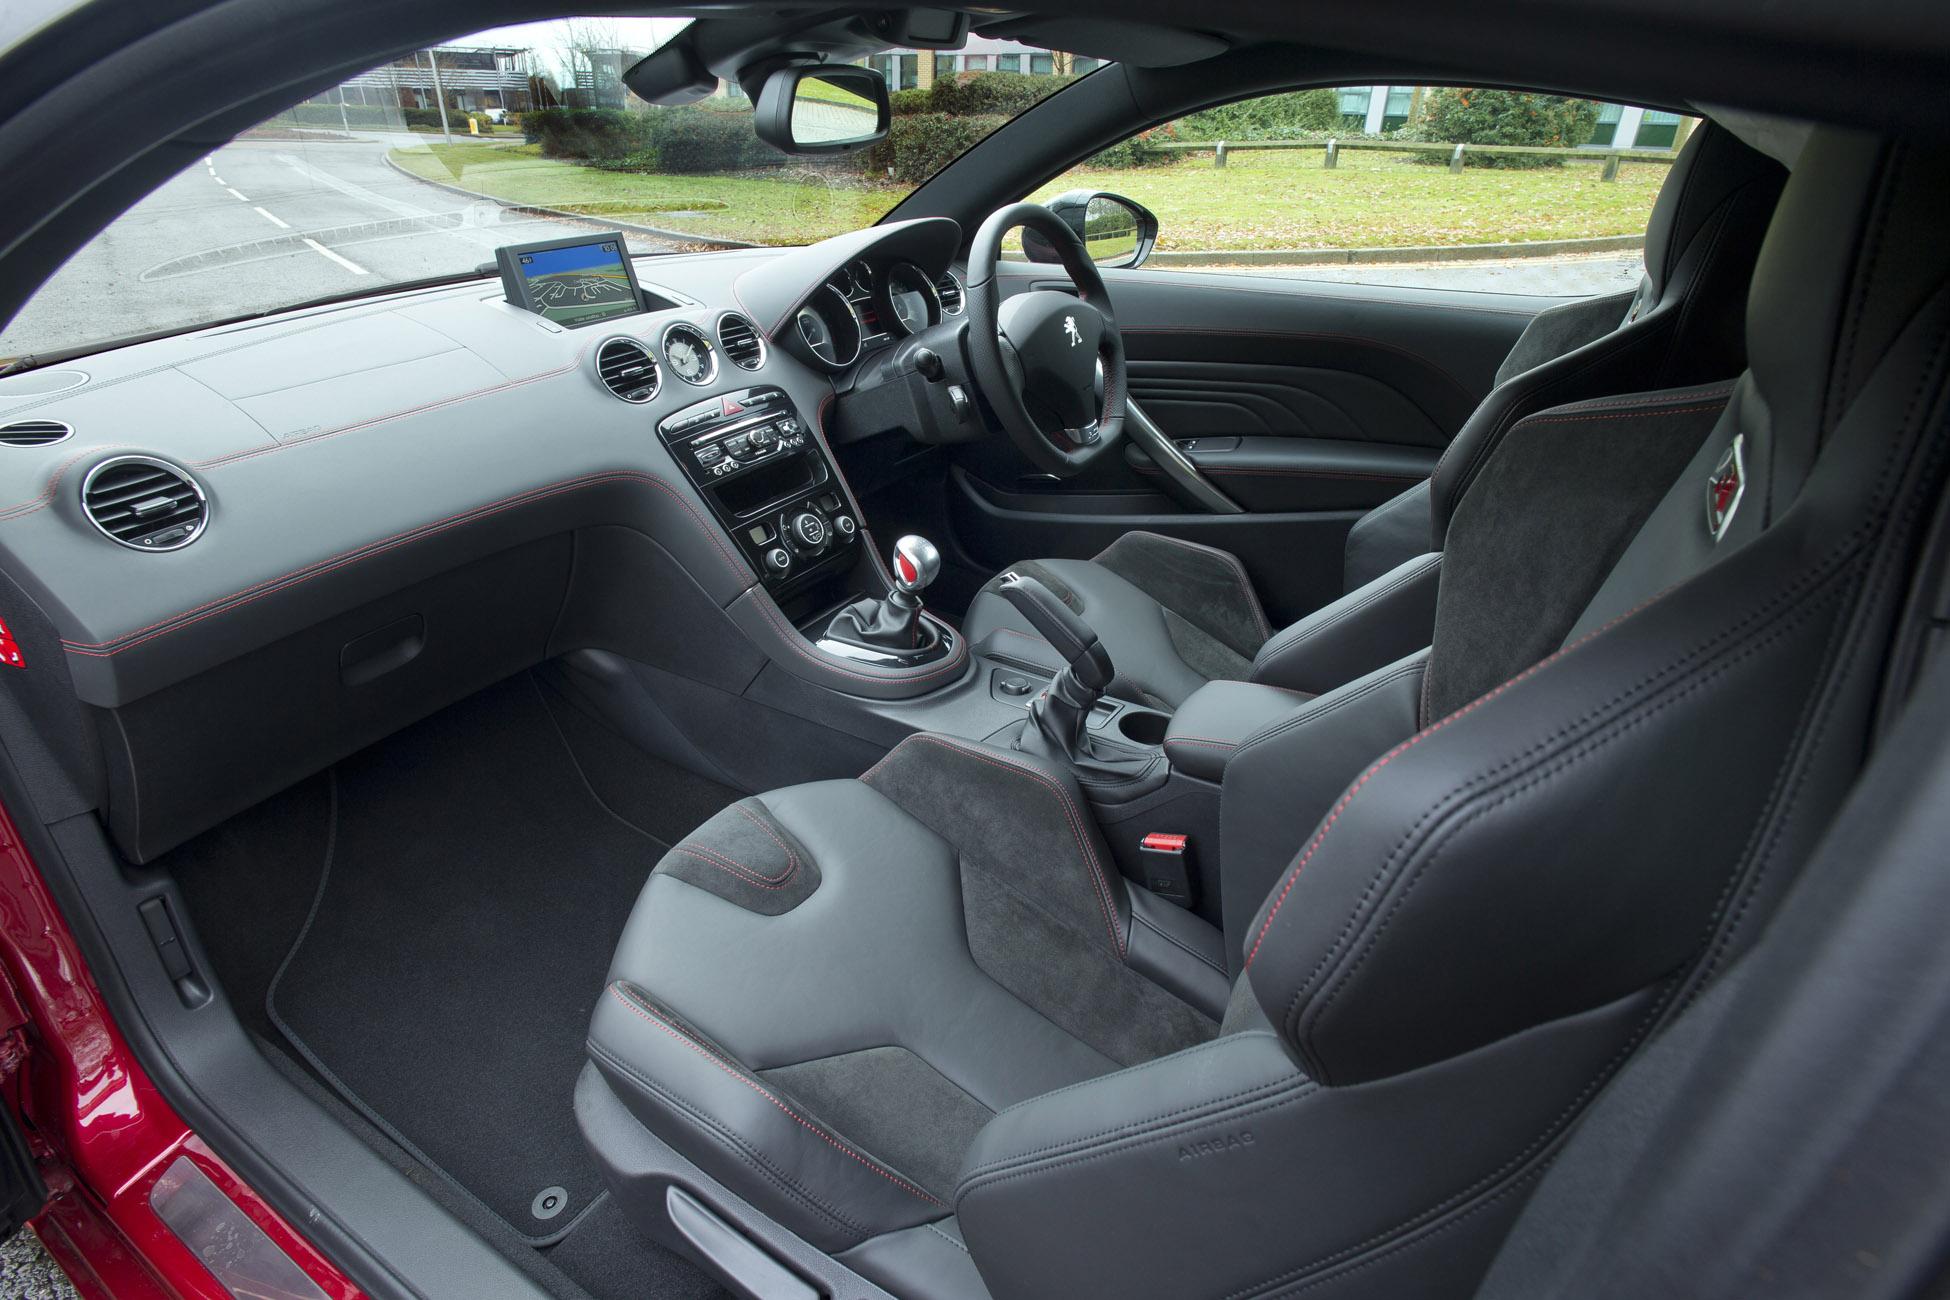 2014 Peugeot RCZ R Sports Coupe